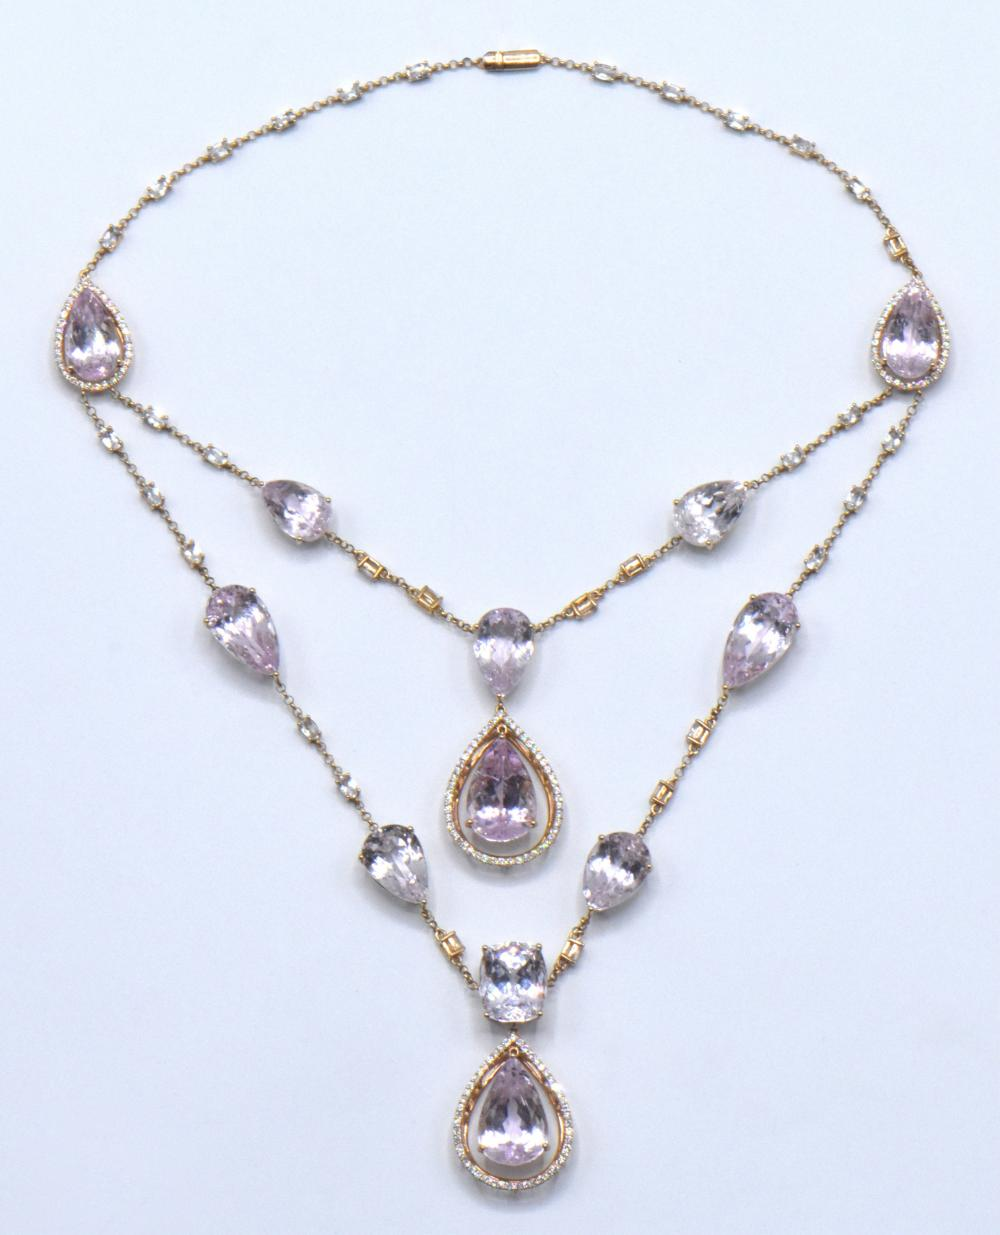 18 Karat Gold, Diamond, Kunzite, & Topaz Necklace